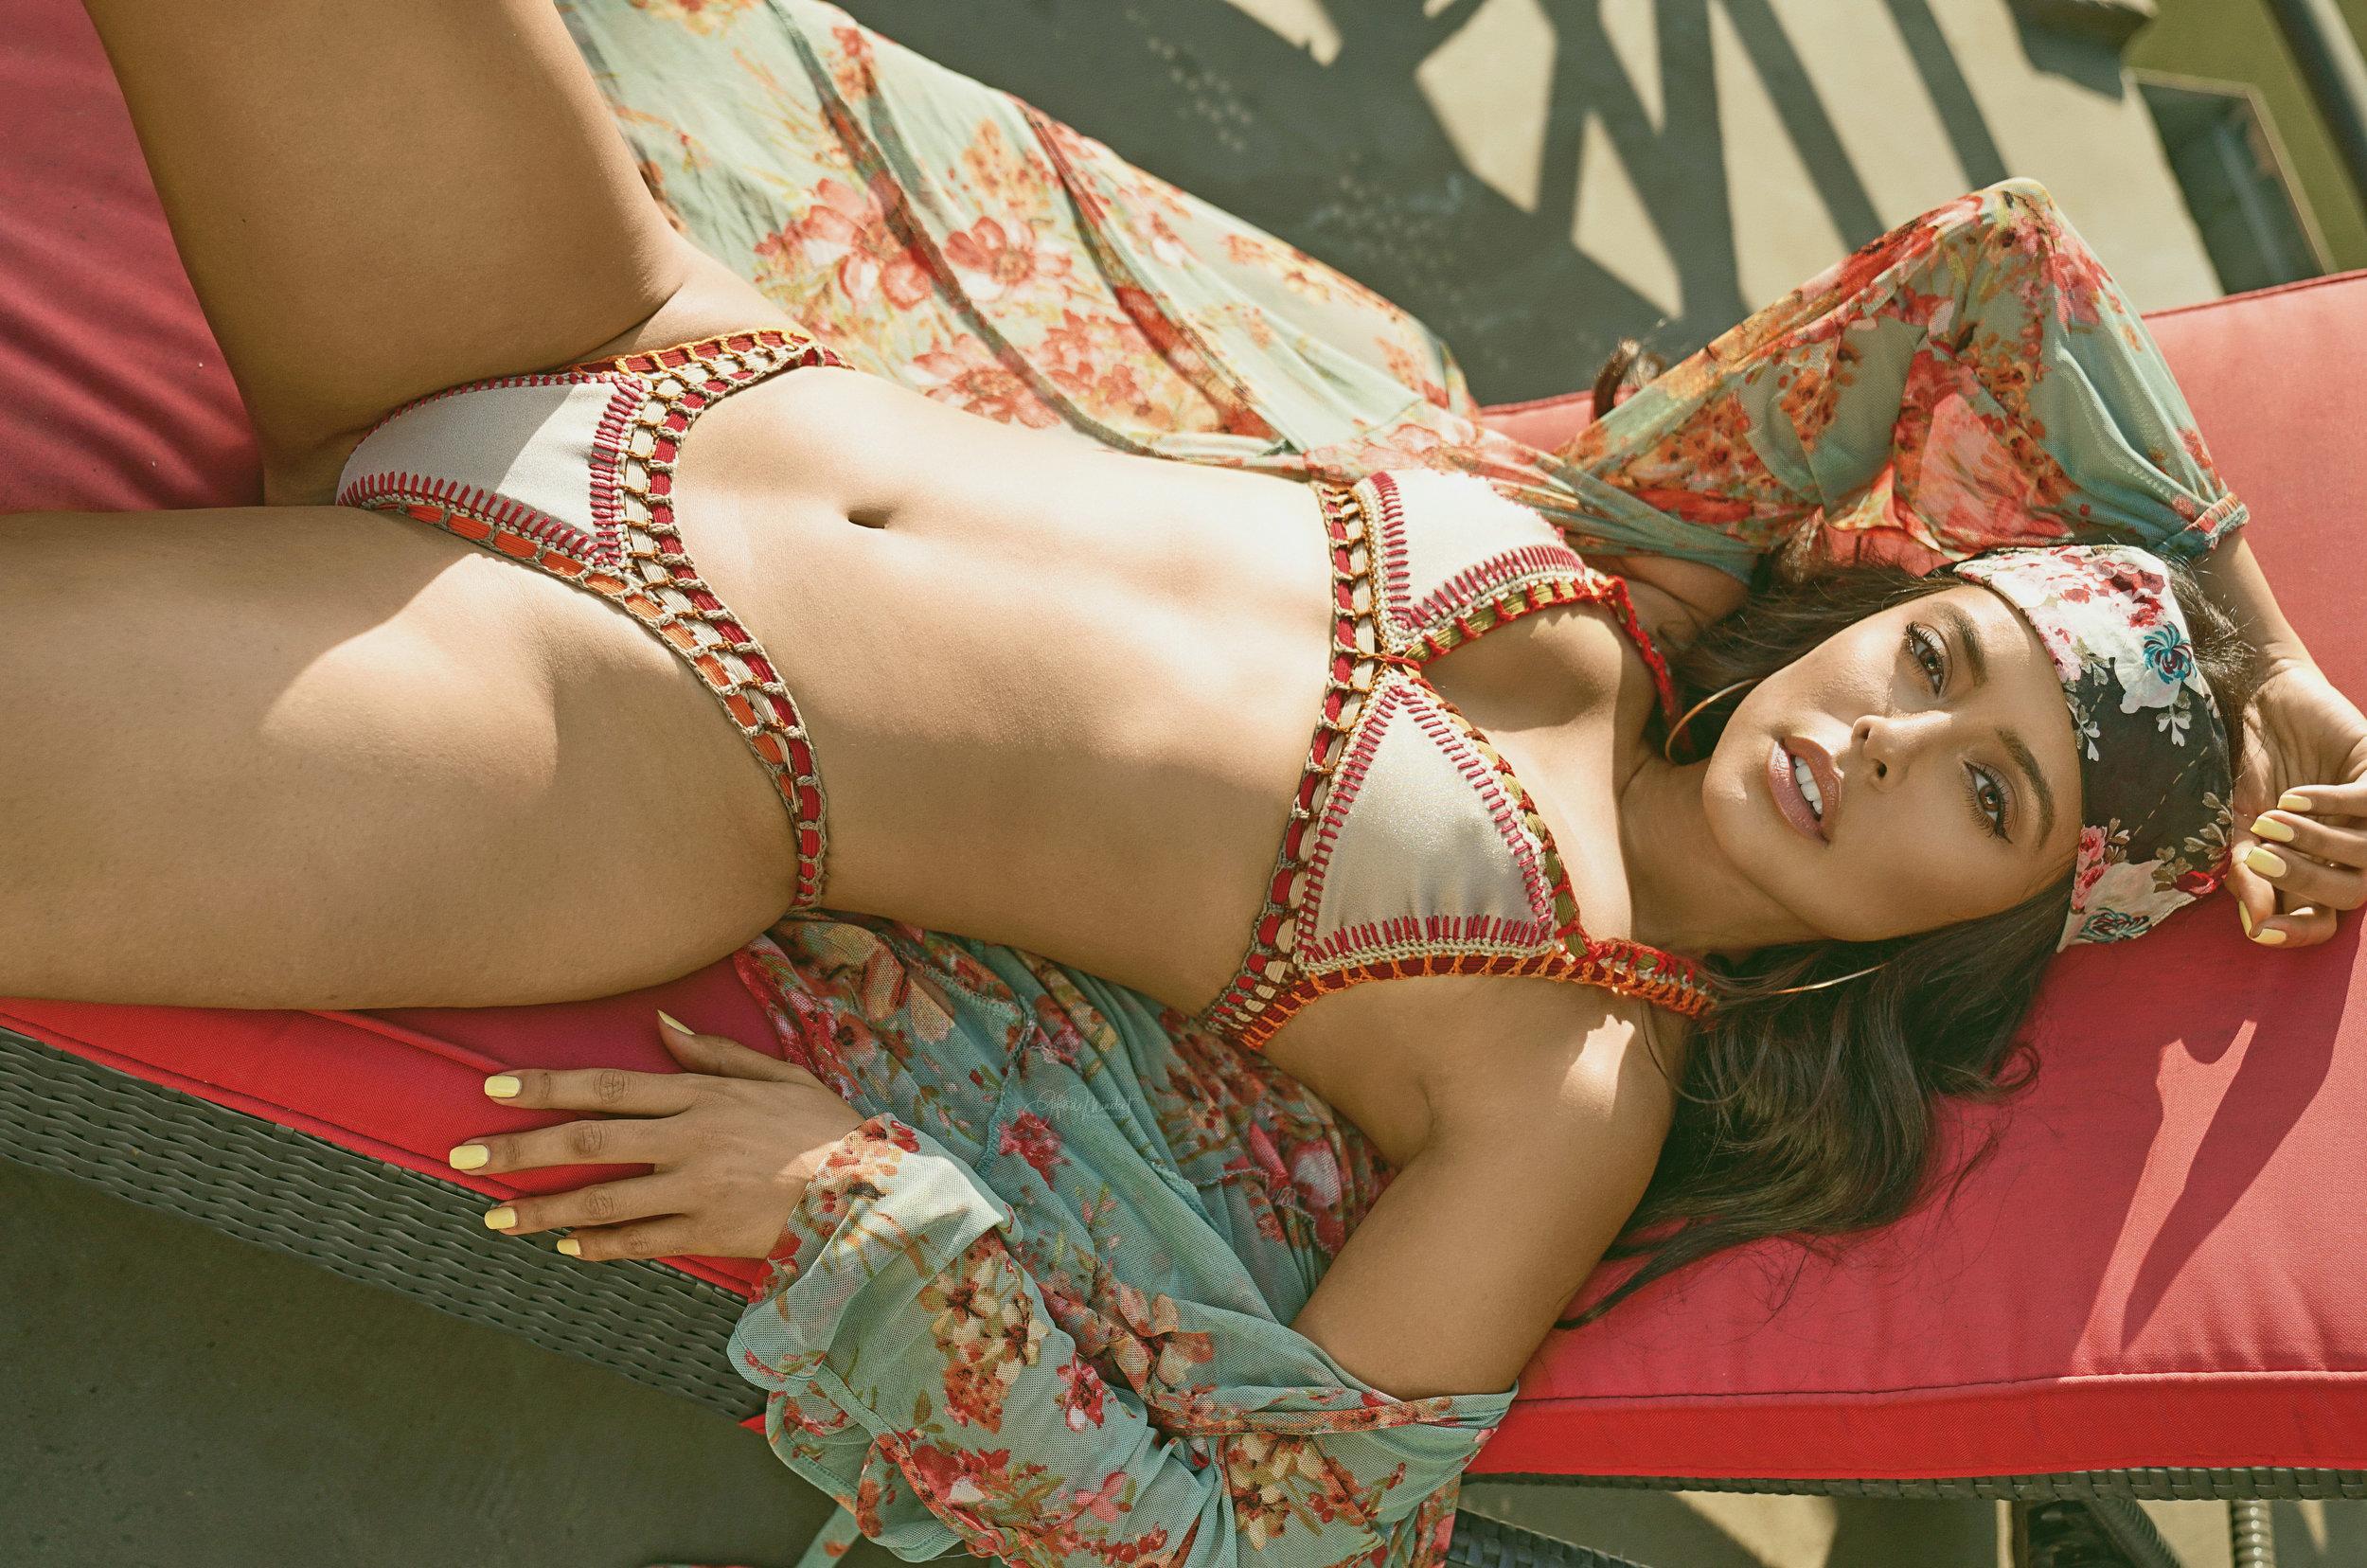 Chelle Belove Bikini Gifted Mindset Photography.jpg